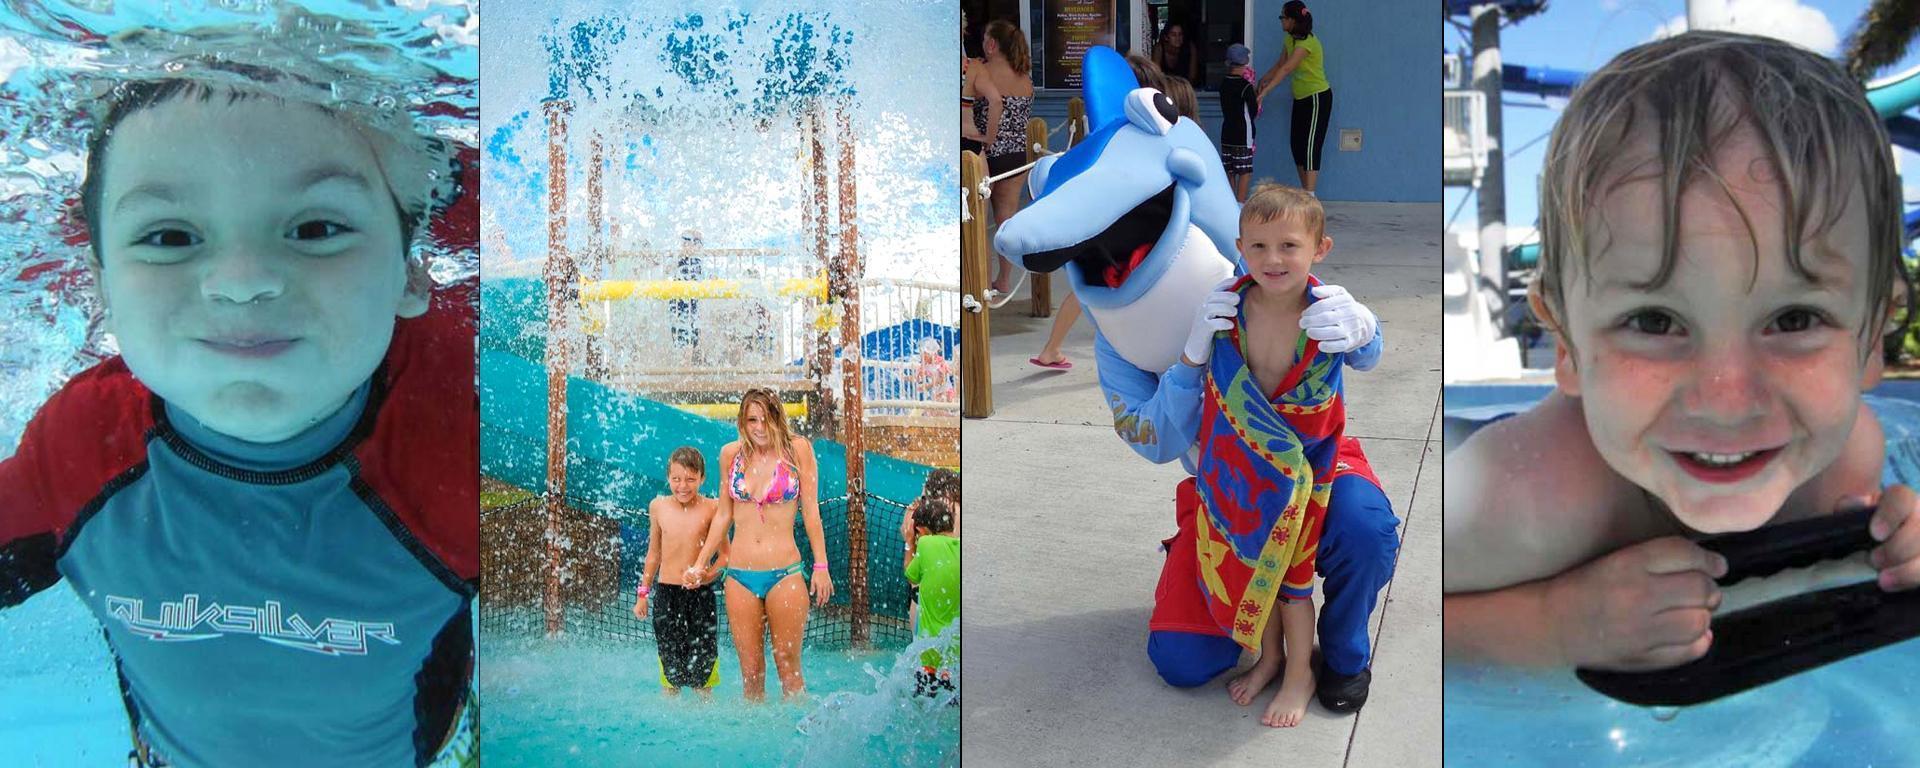 Kids and teens enjoying Sailfish Splash Waterpark